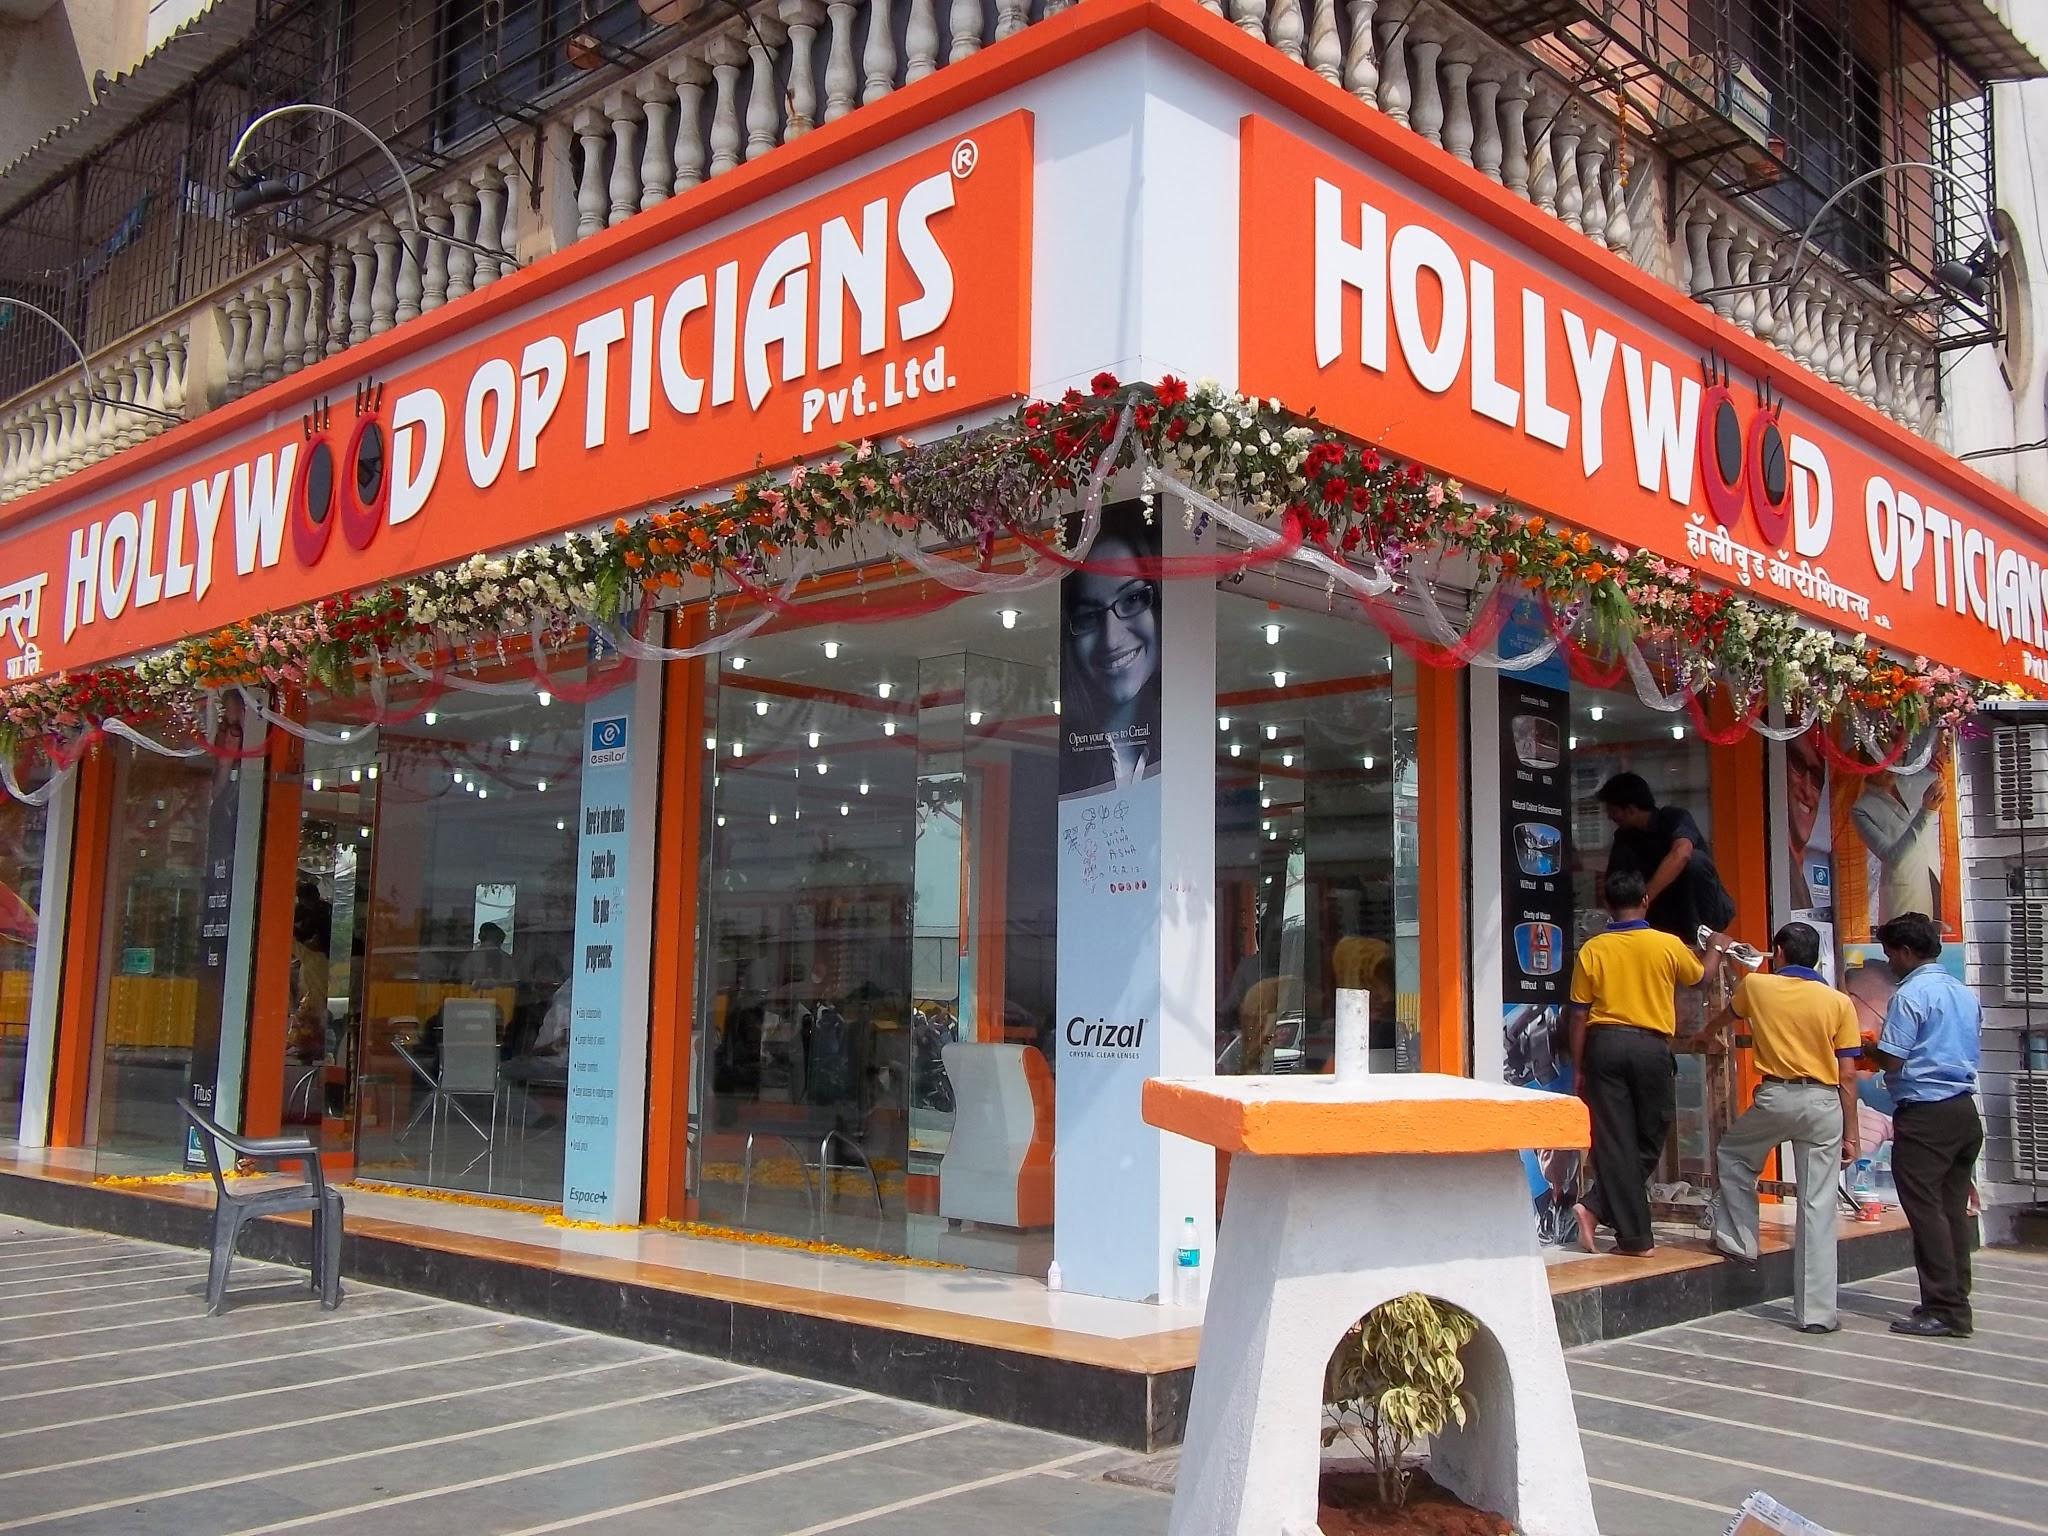 Hollywood Opticians - Seawoods - Navi Mumbai Image